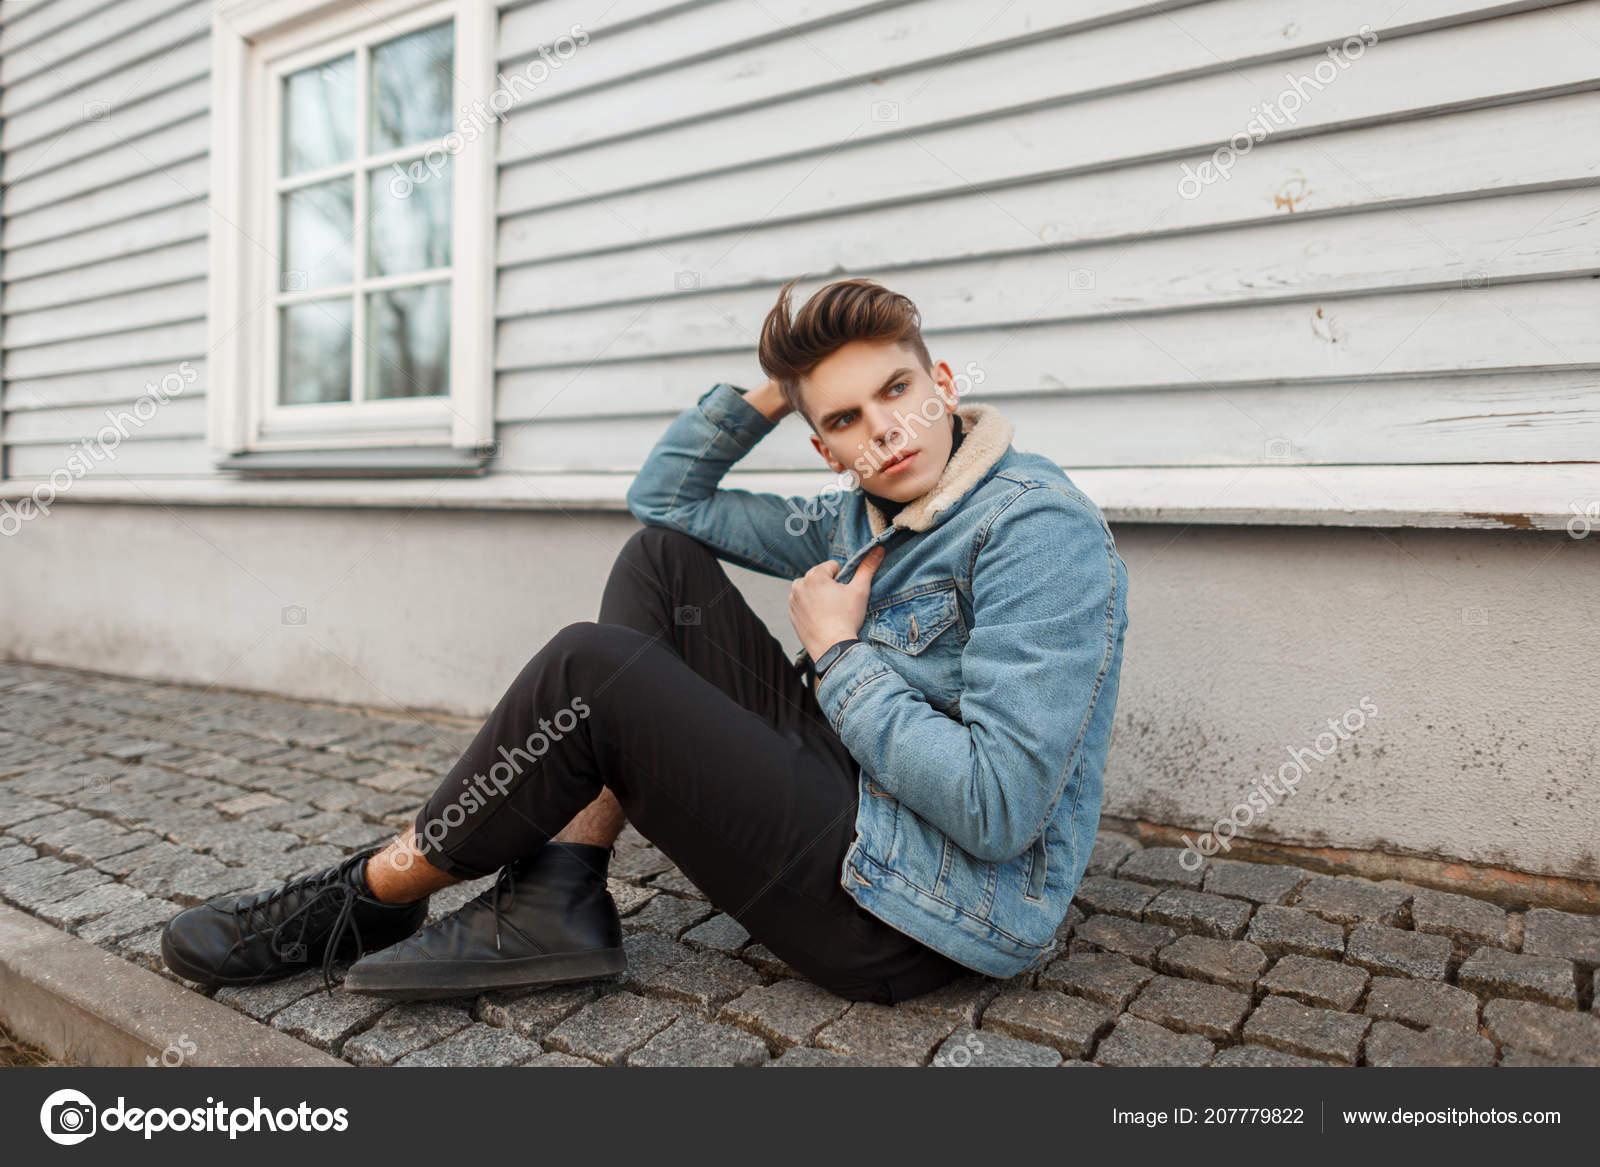 Stylish Young Man Haircut Fashion Denim Vintage Clothes Sitting